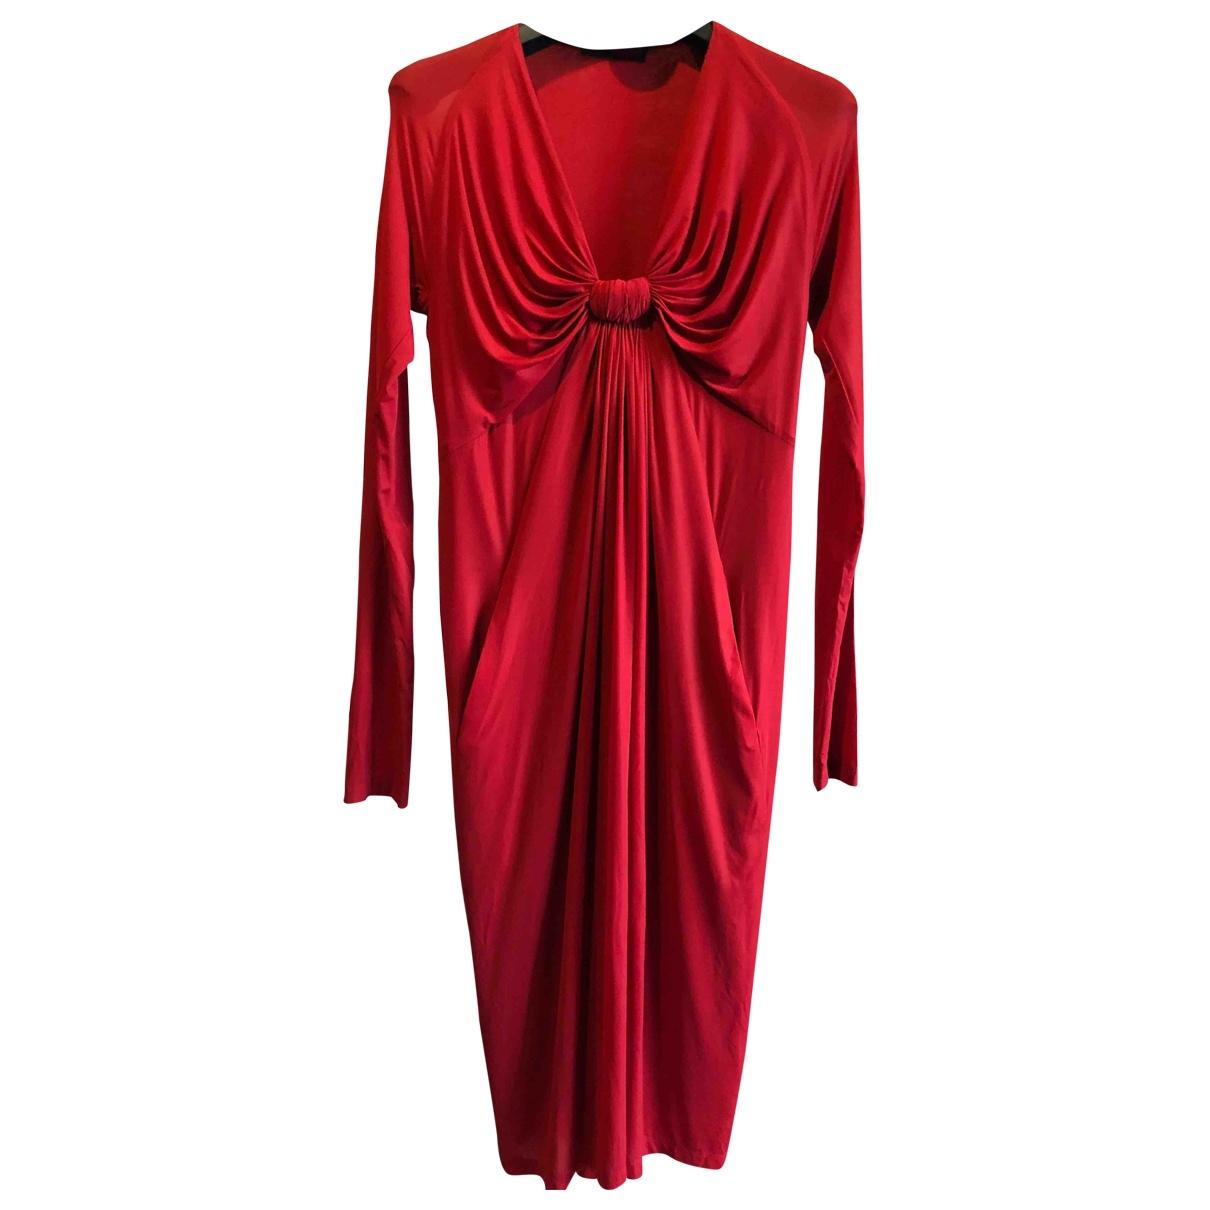 Donna Karan N Red Dress for Women